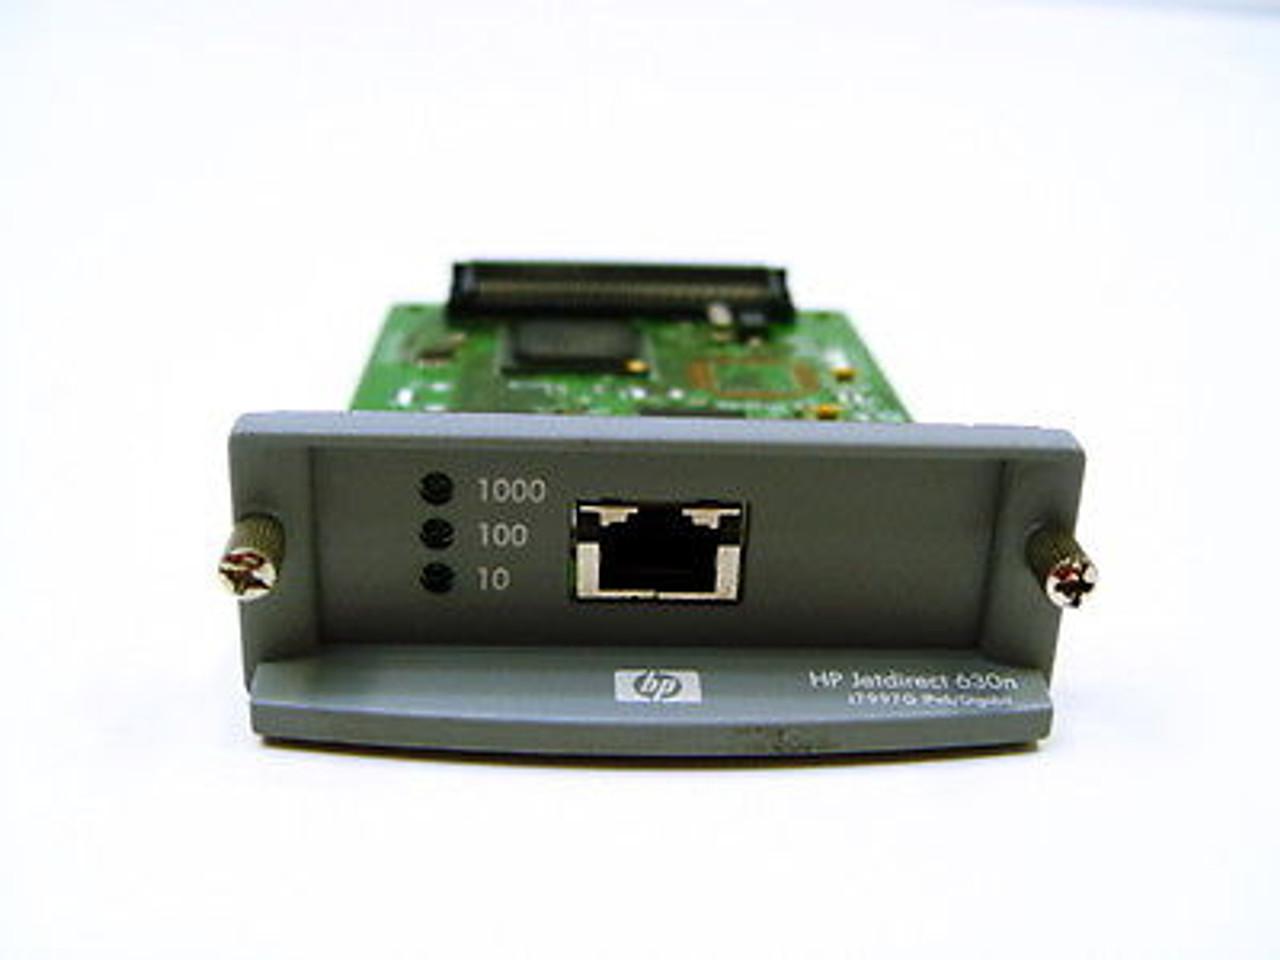 HP JetDirect 630n Print server - EIO